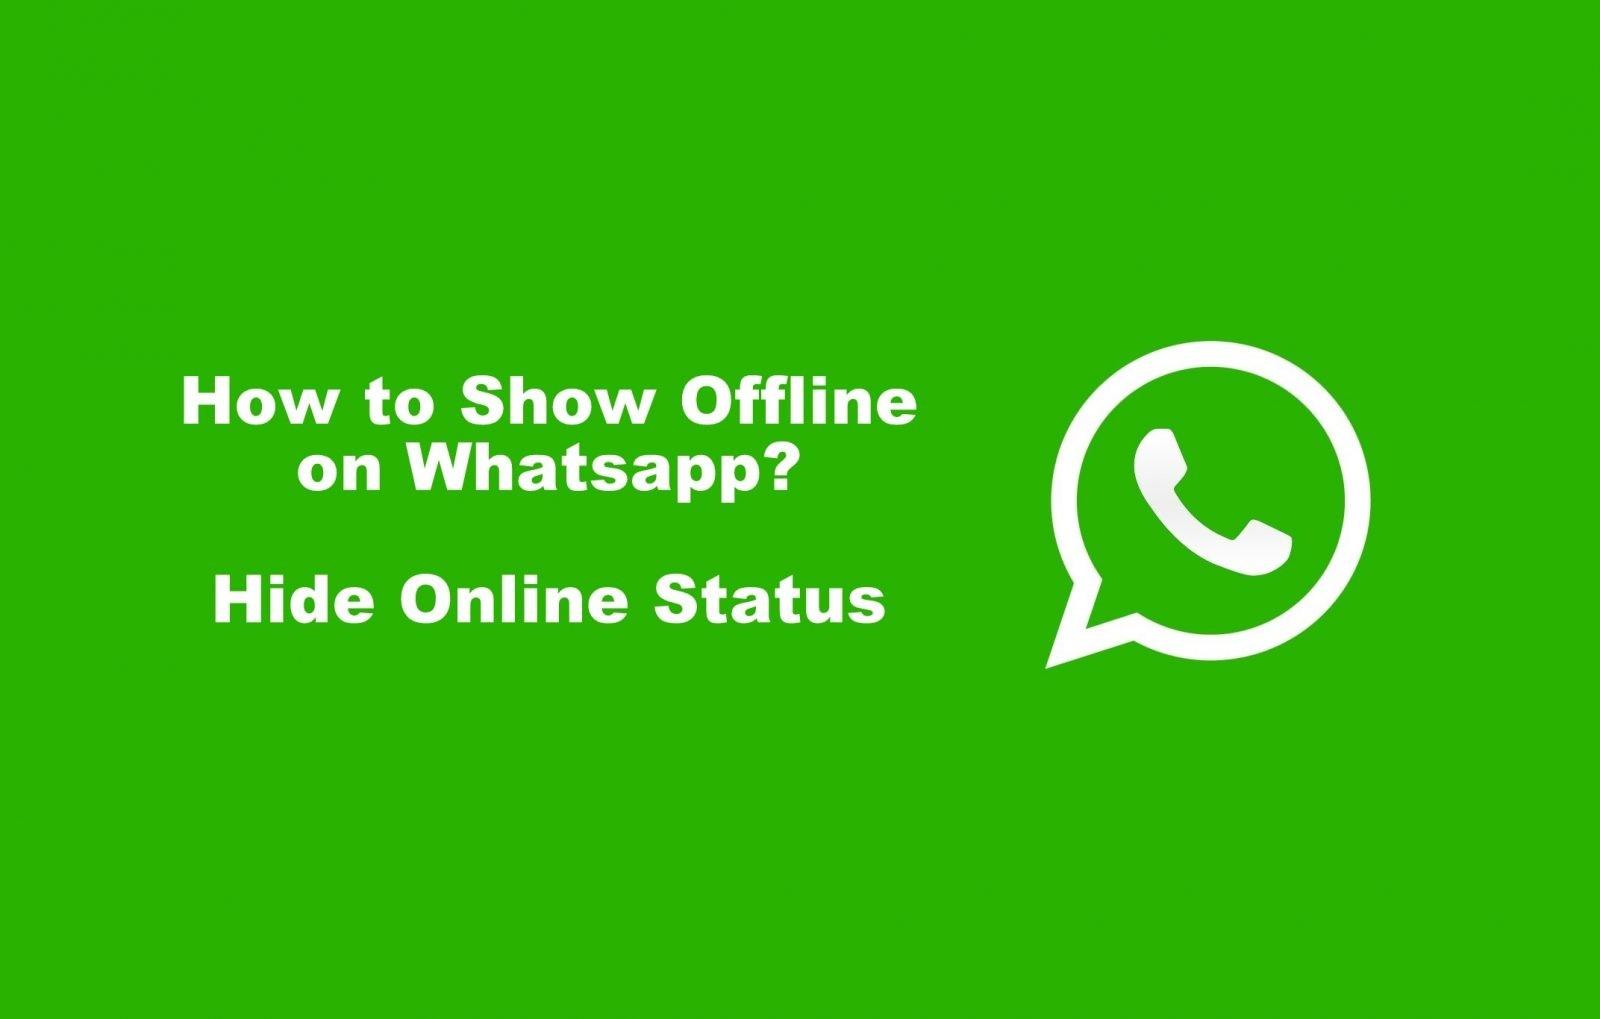 How to Show Offline on WhatsApp (Hide Your Online Status)